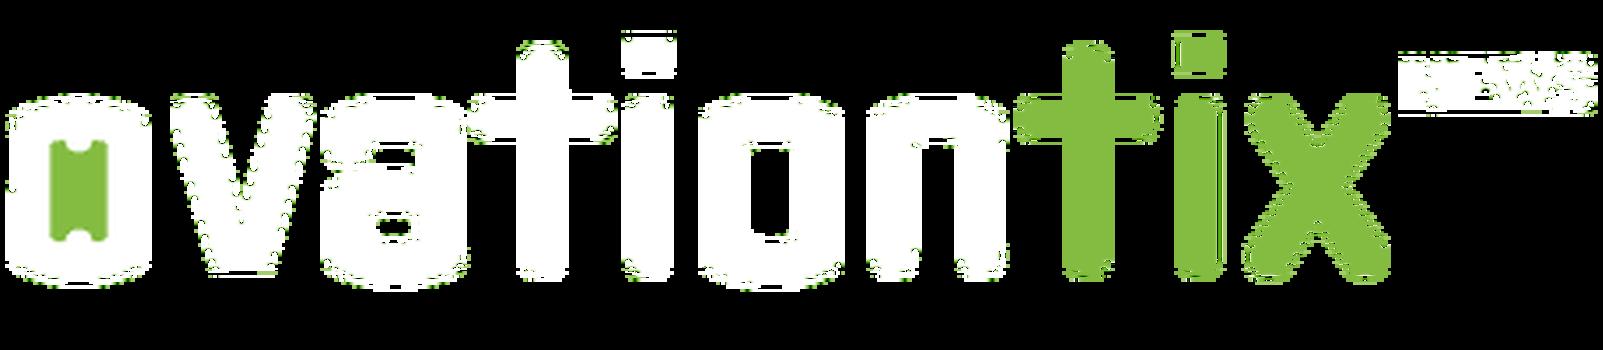 OvationTix logo